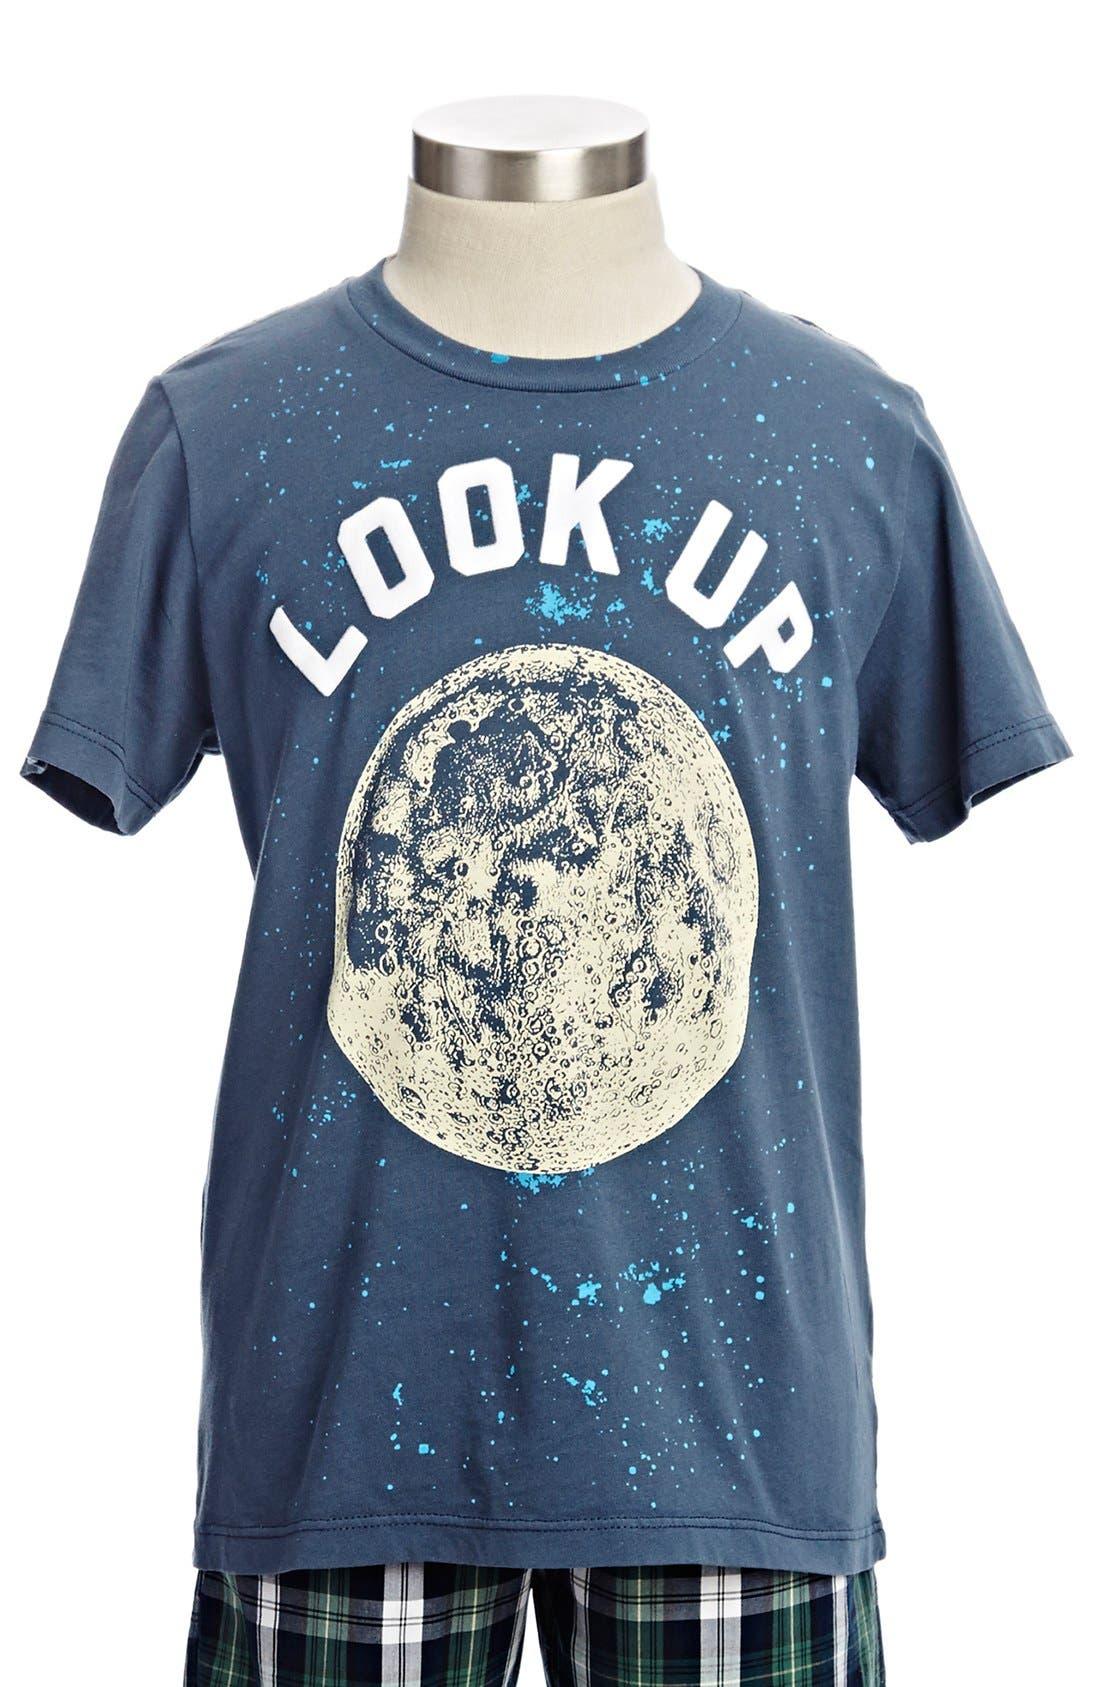 Main Image - Peek 'Look Up' T-Shirt (Toddler Boys, Little Boys & Big Boys)